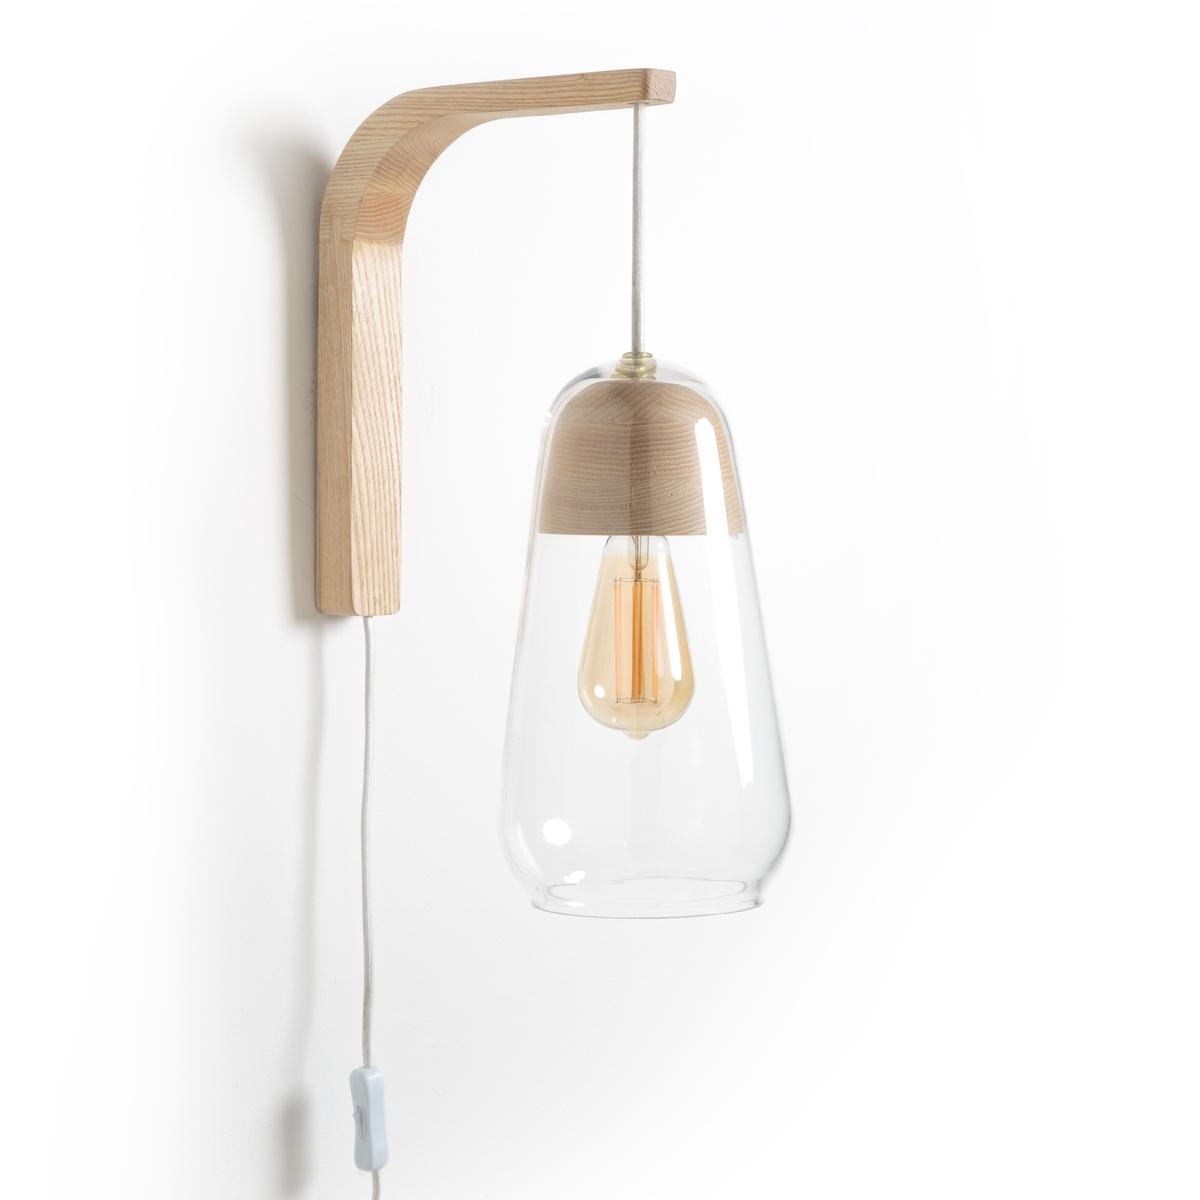 Nasoa Contemporary Wall Light In Glass & Wood